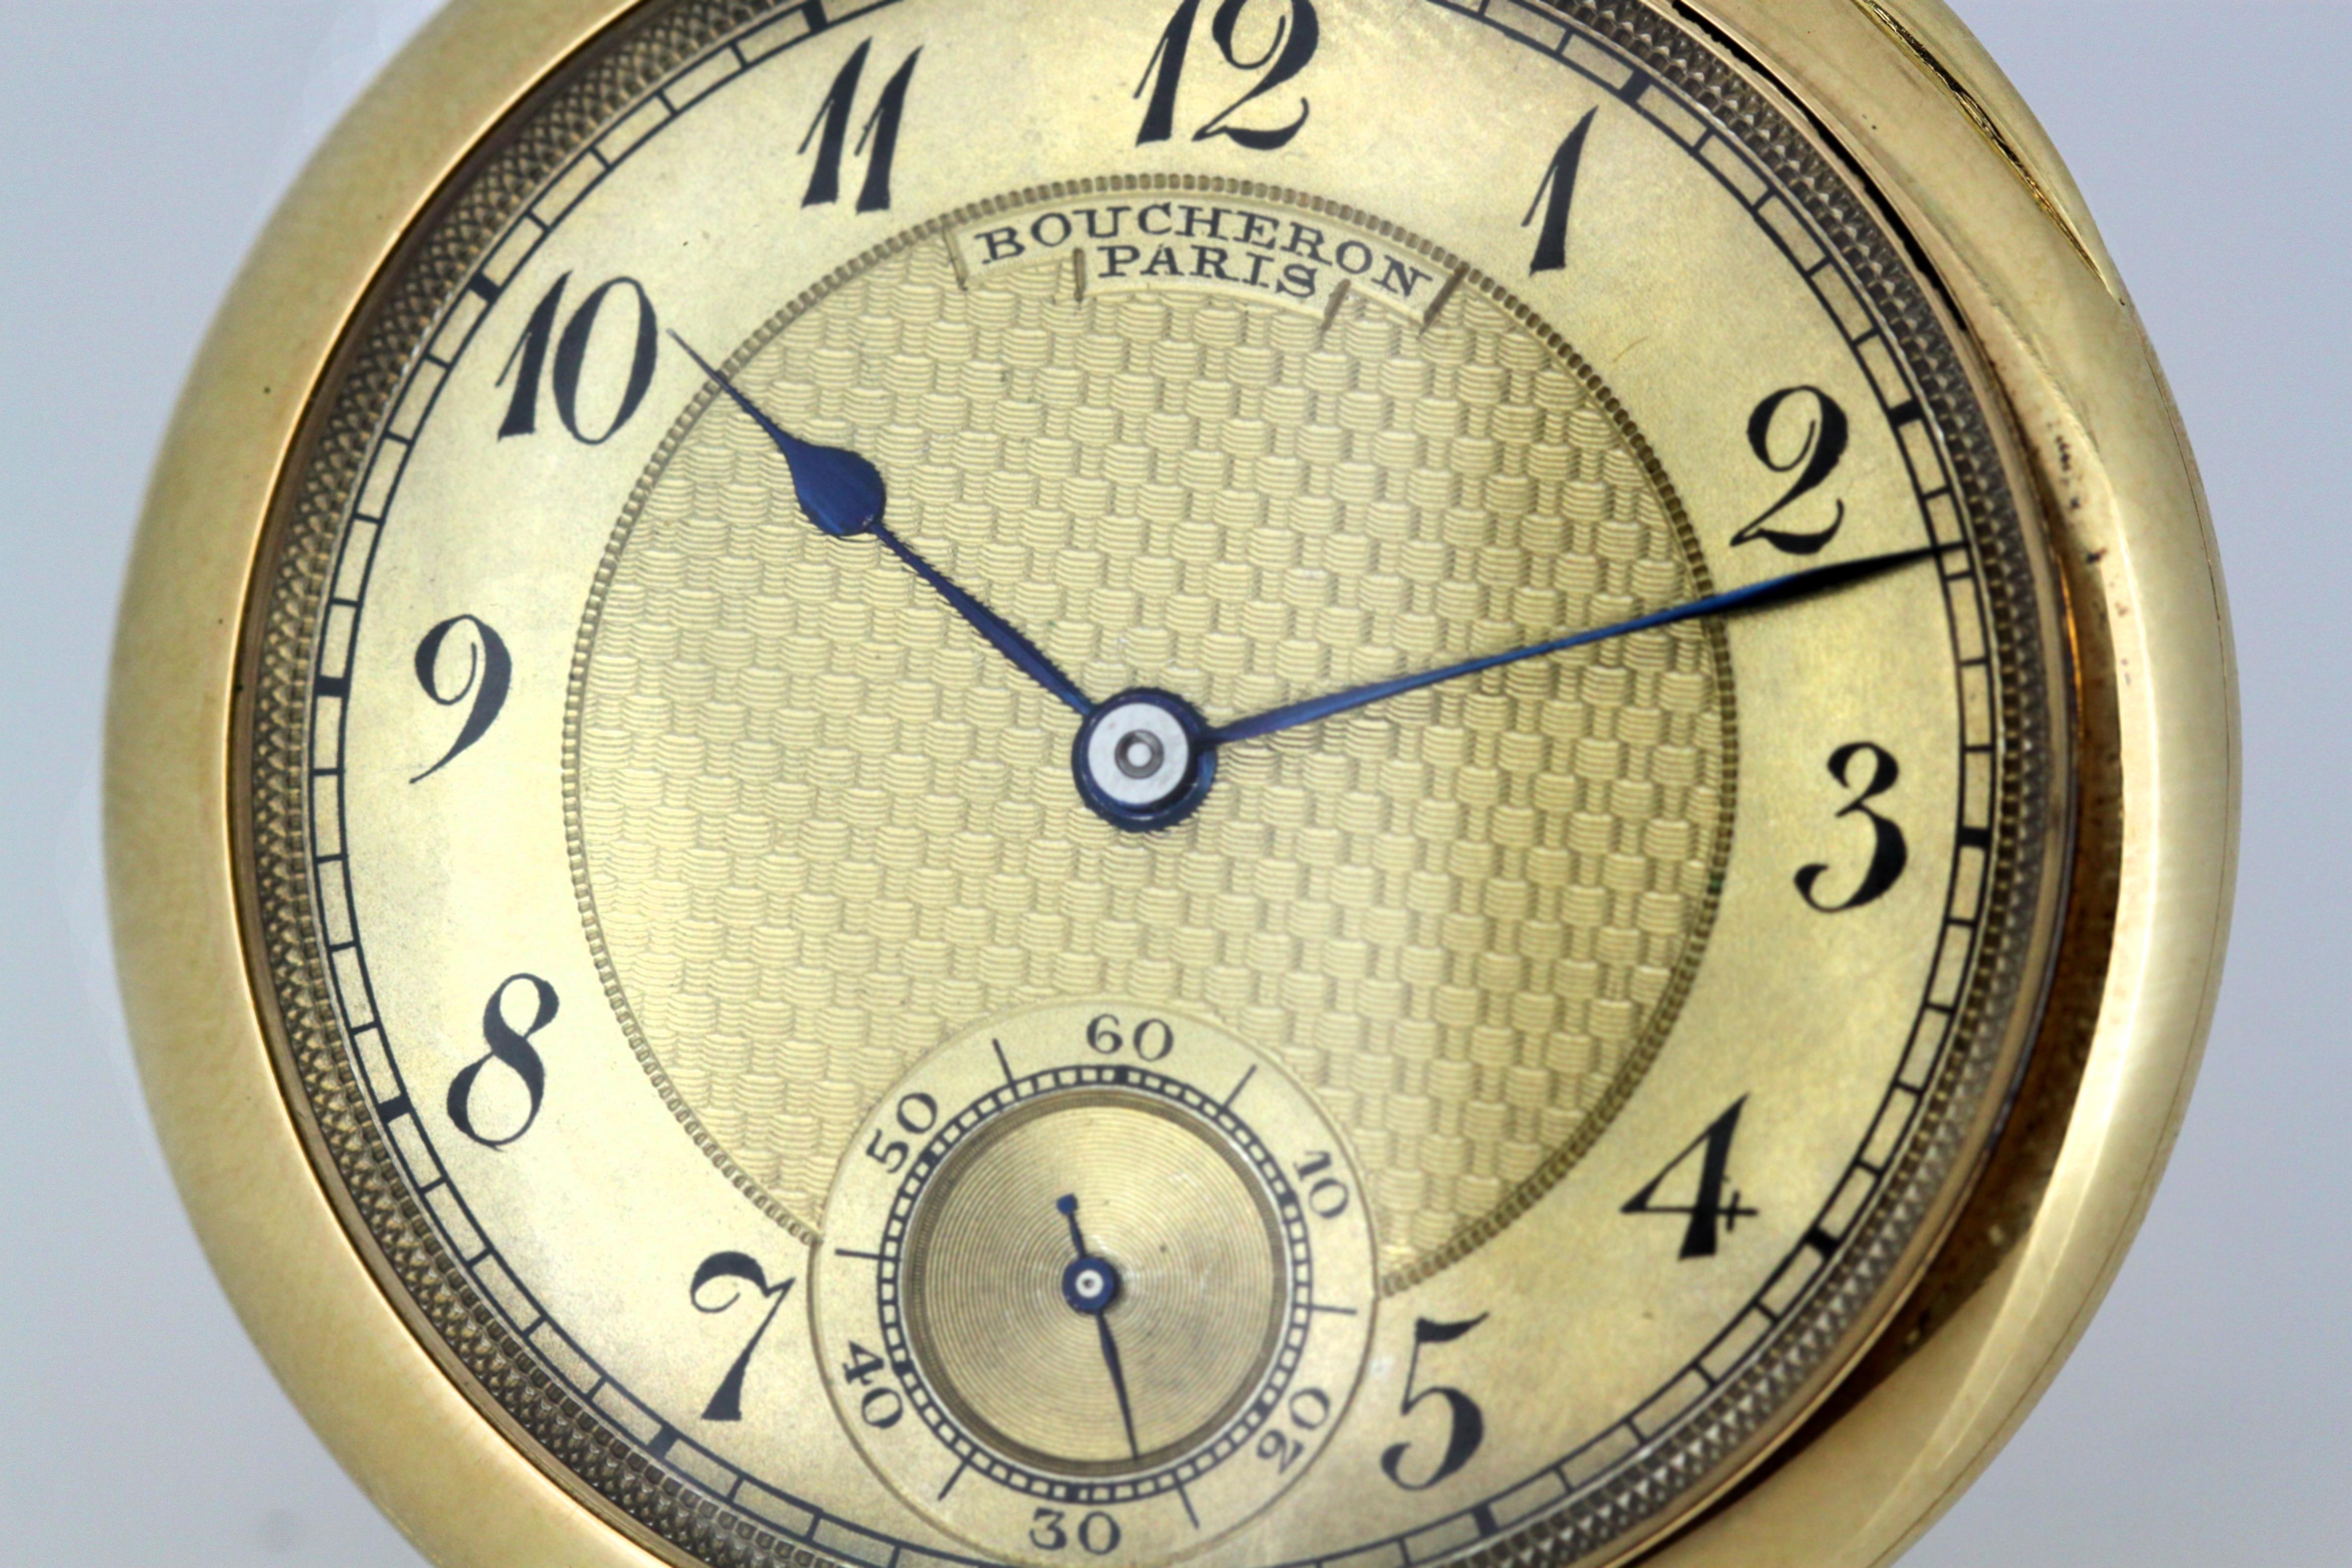 2371b475d Patek Philippe for Boucheron, 18 Karat Gold Pocket Watch, 1907 For Sale at  1stdibs